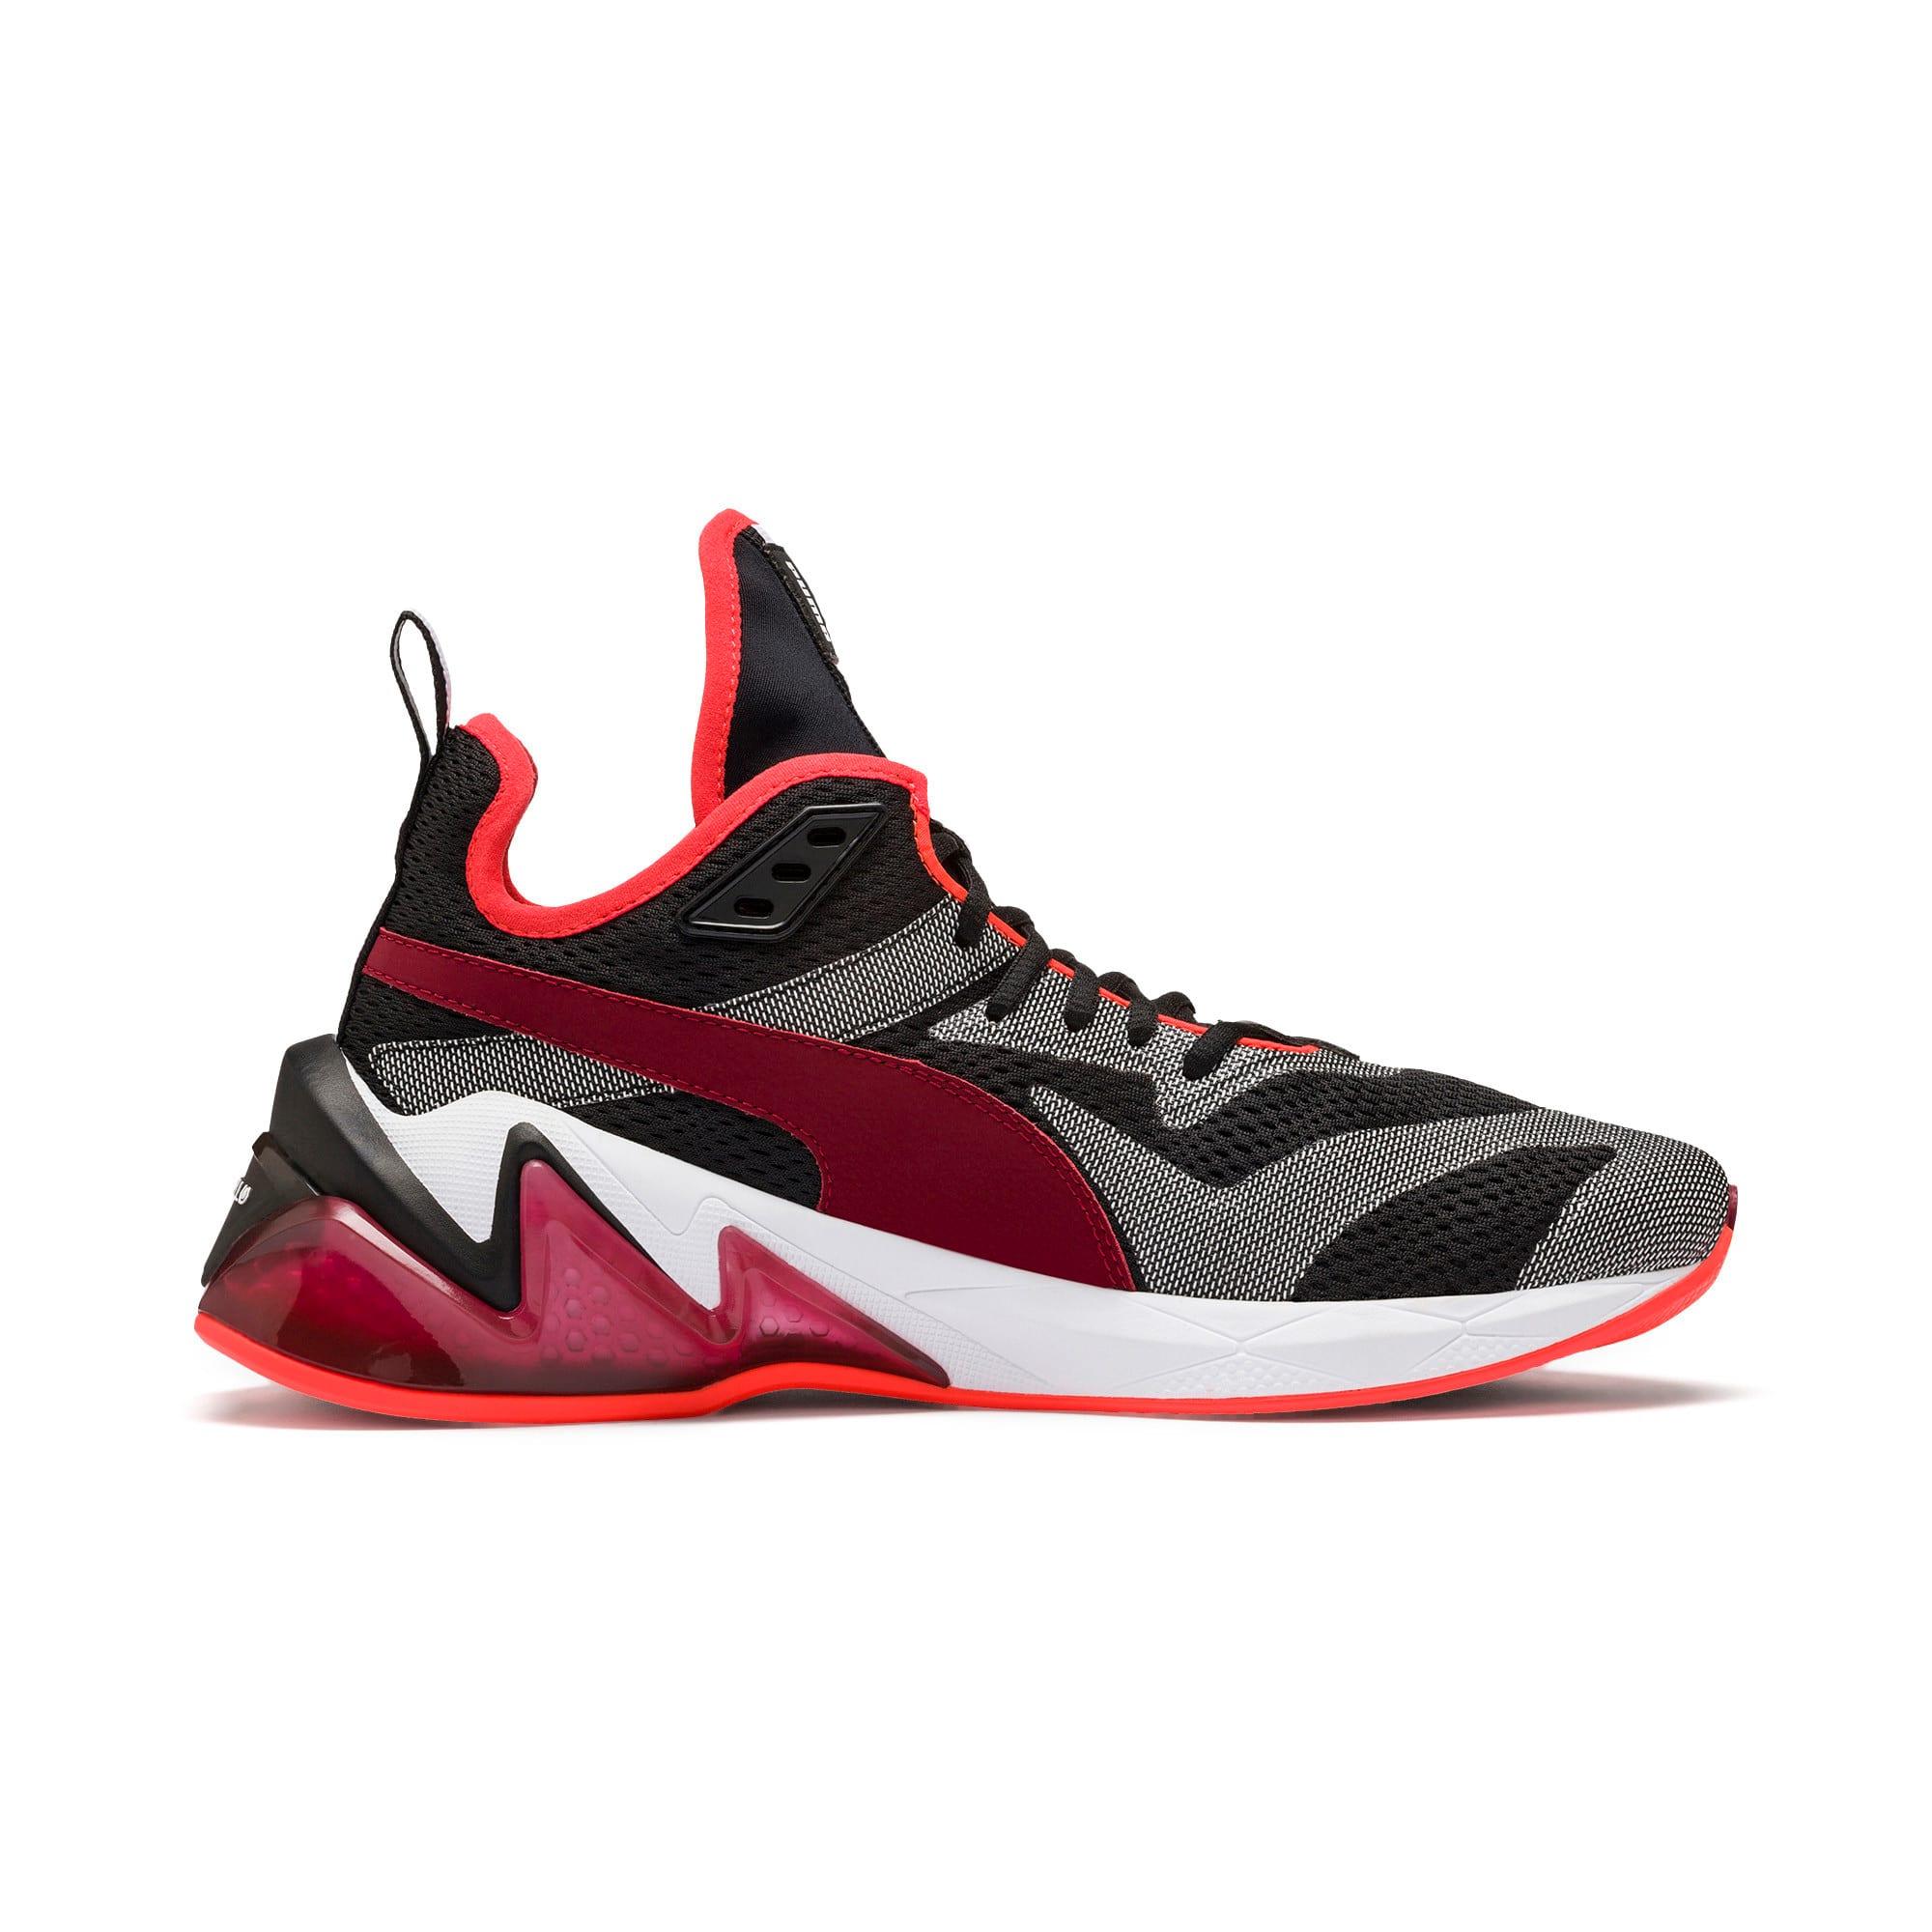 Thumbnail 6 of LQDCELL Origin Tech Men's Shoes, Puma Black-Rhubarb, medium